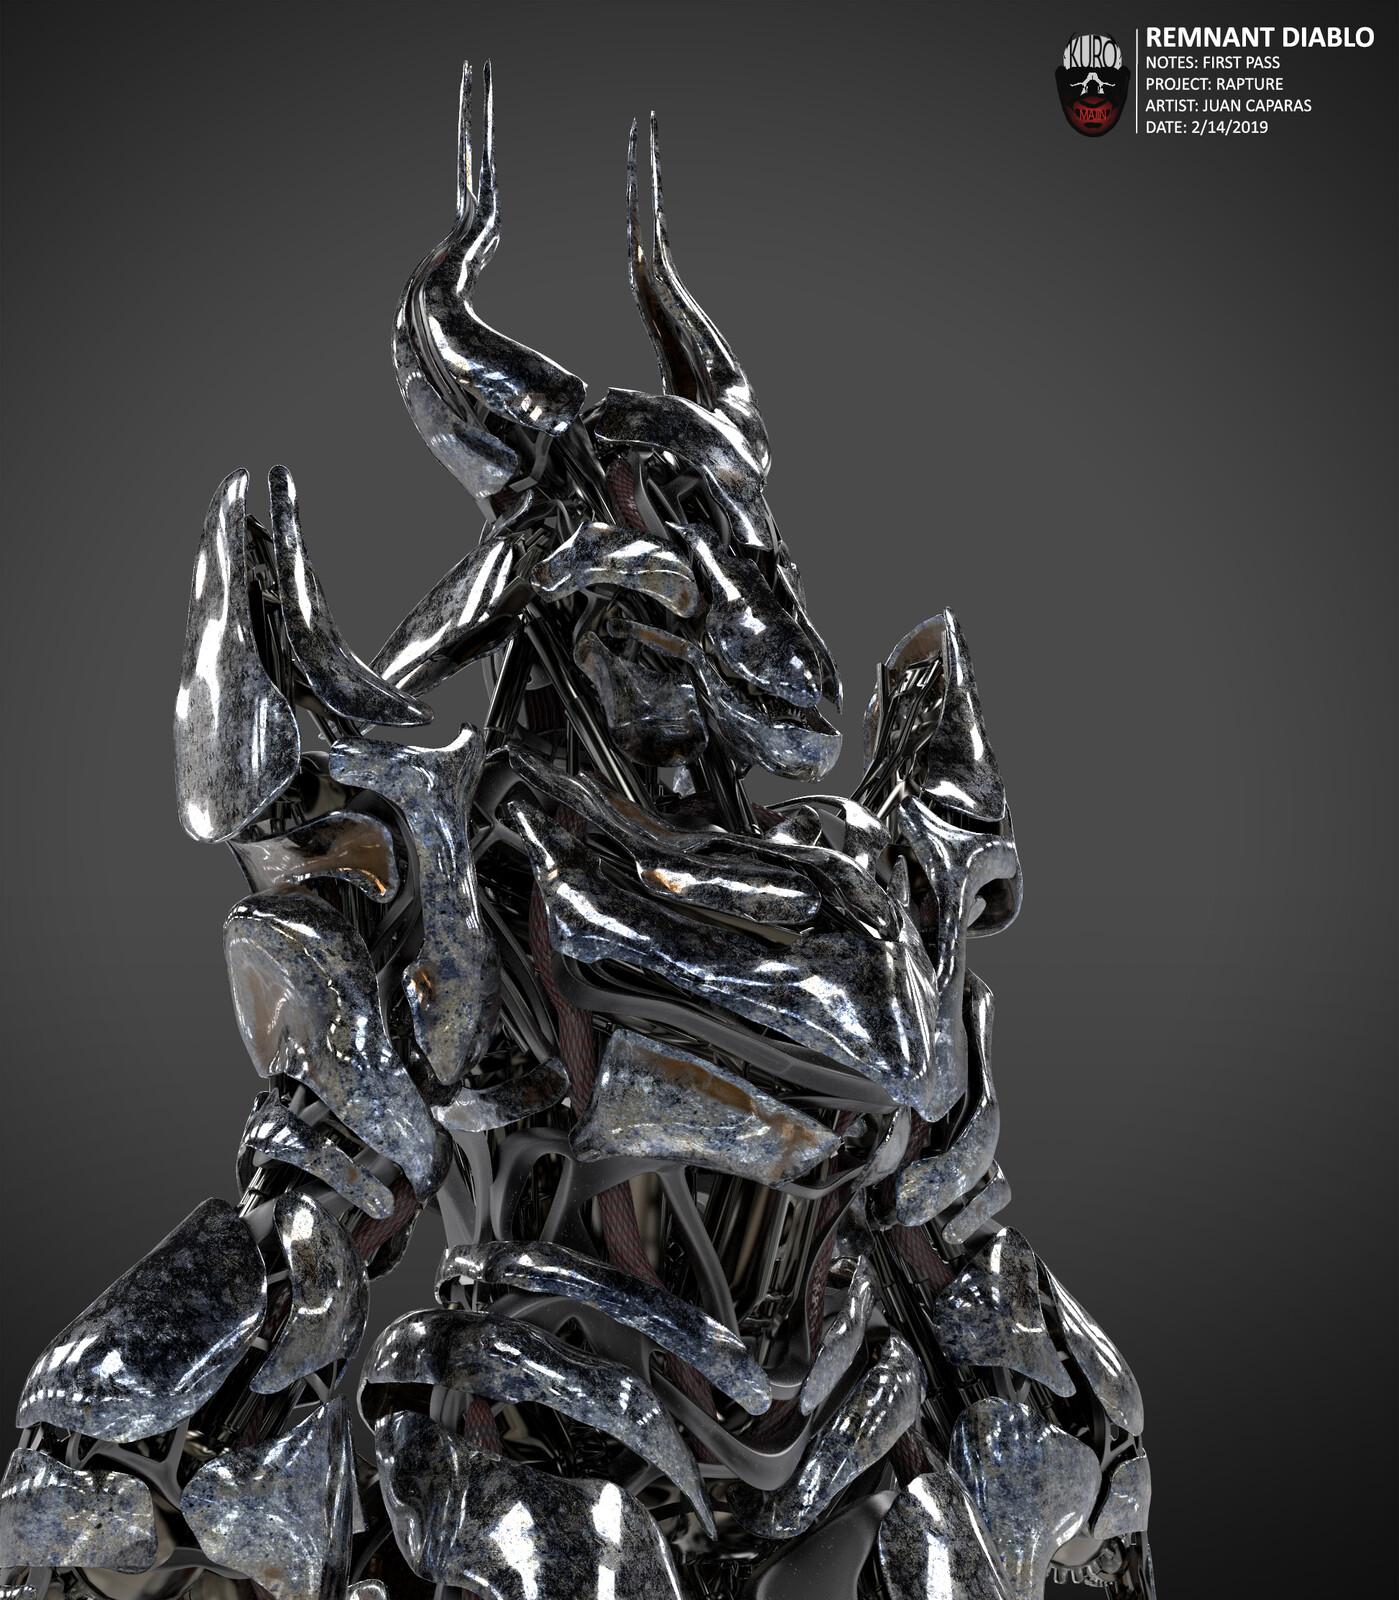 Remnant Diablo Concept | Kuro Majin Productions